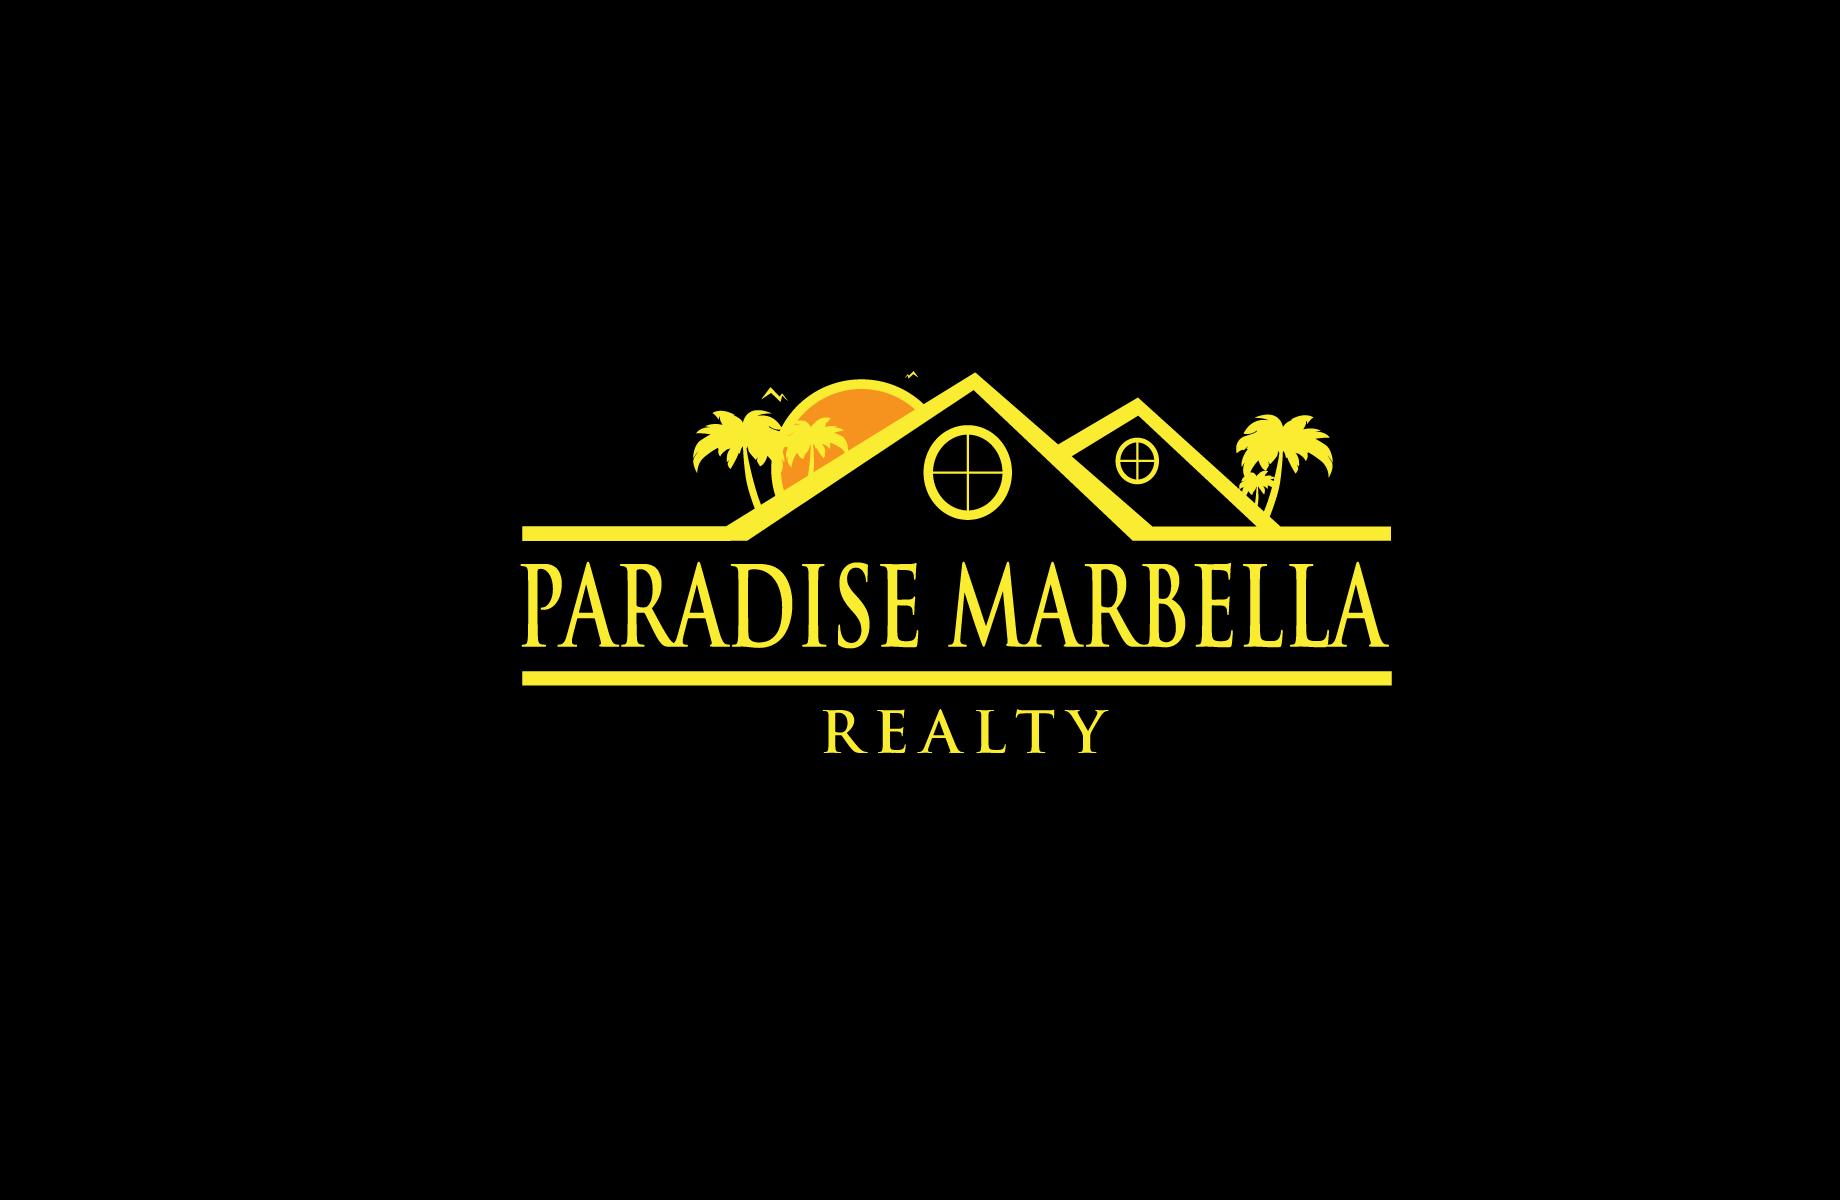 Logo Design by Jan Chua - Entry No. 39 in the Logo Design Contest Captivating Logo Design for Paradise Marbella Realty.